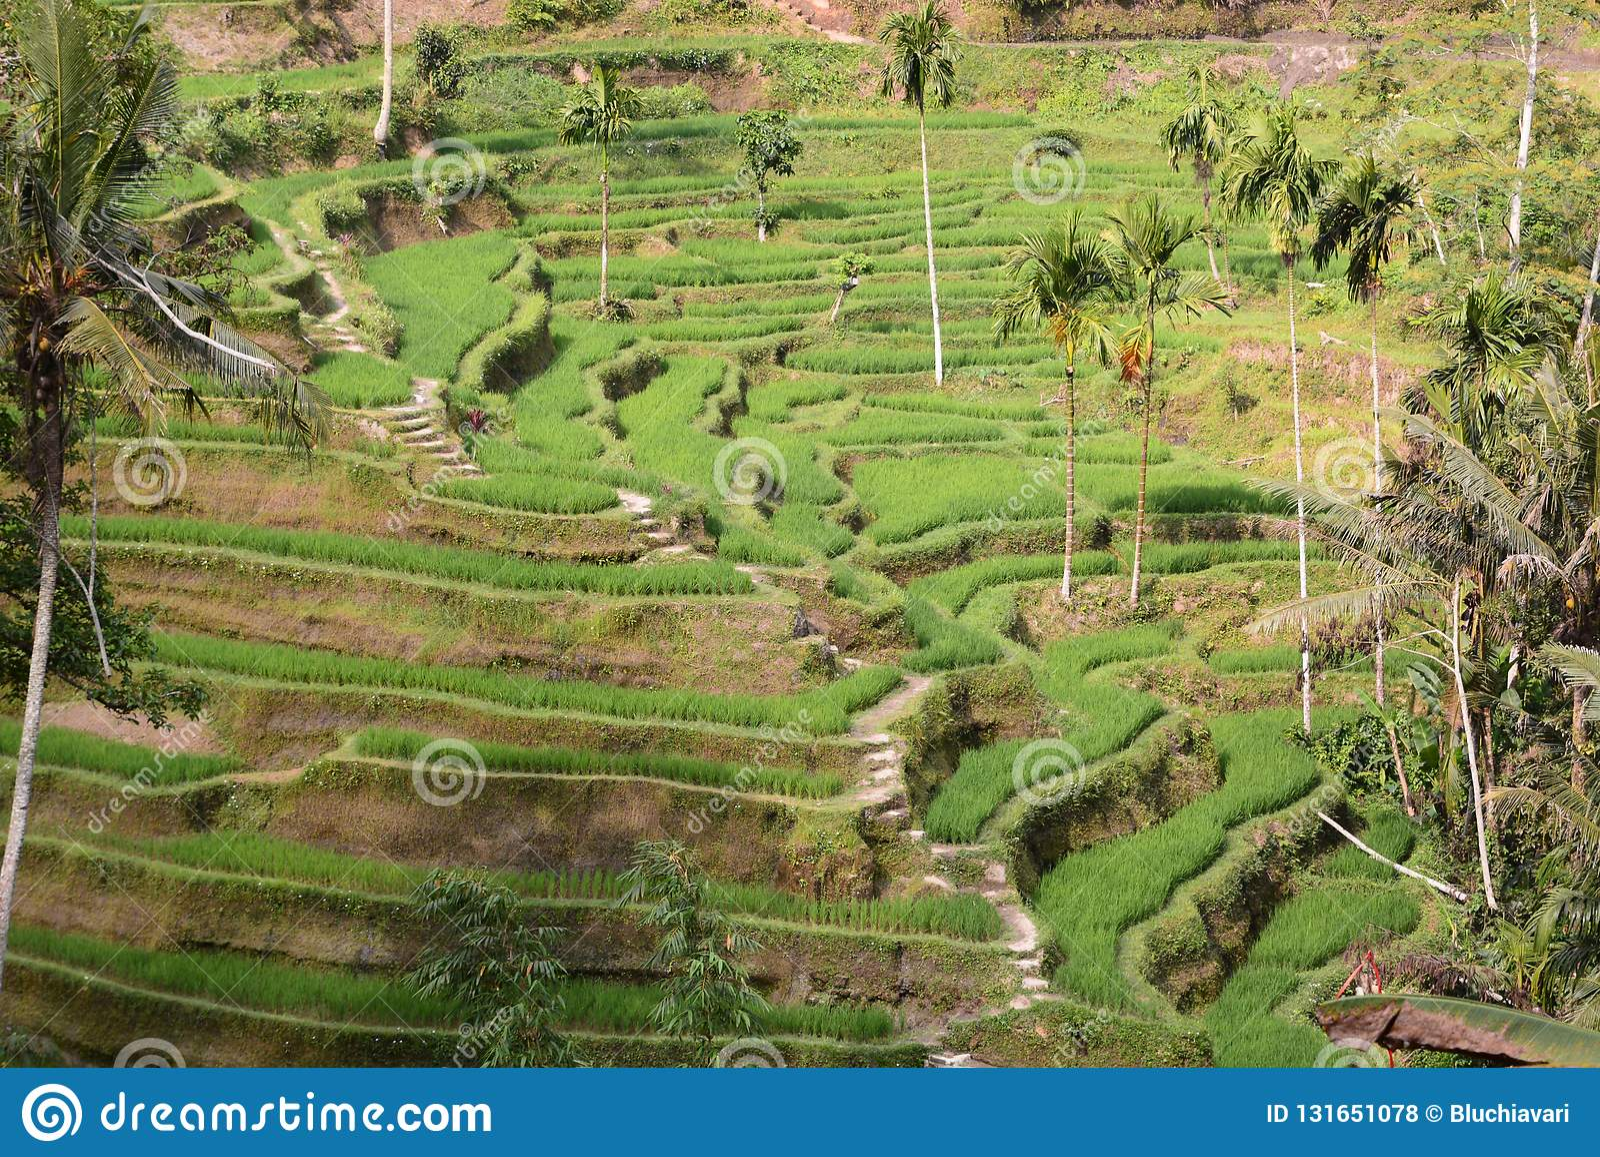 Le Risaie A Terrazze In Tegallalang Reggenza Di Gianyar Bali